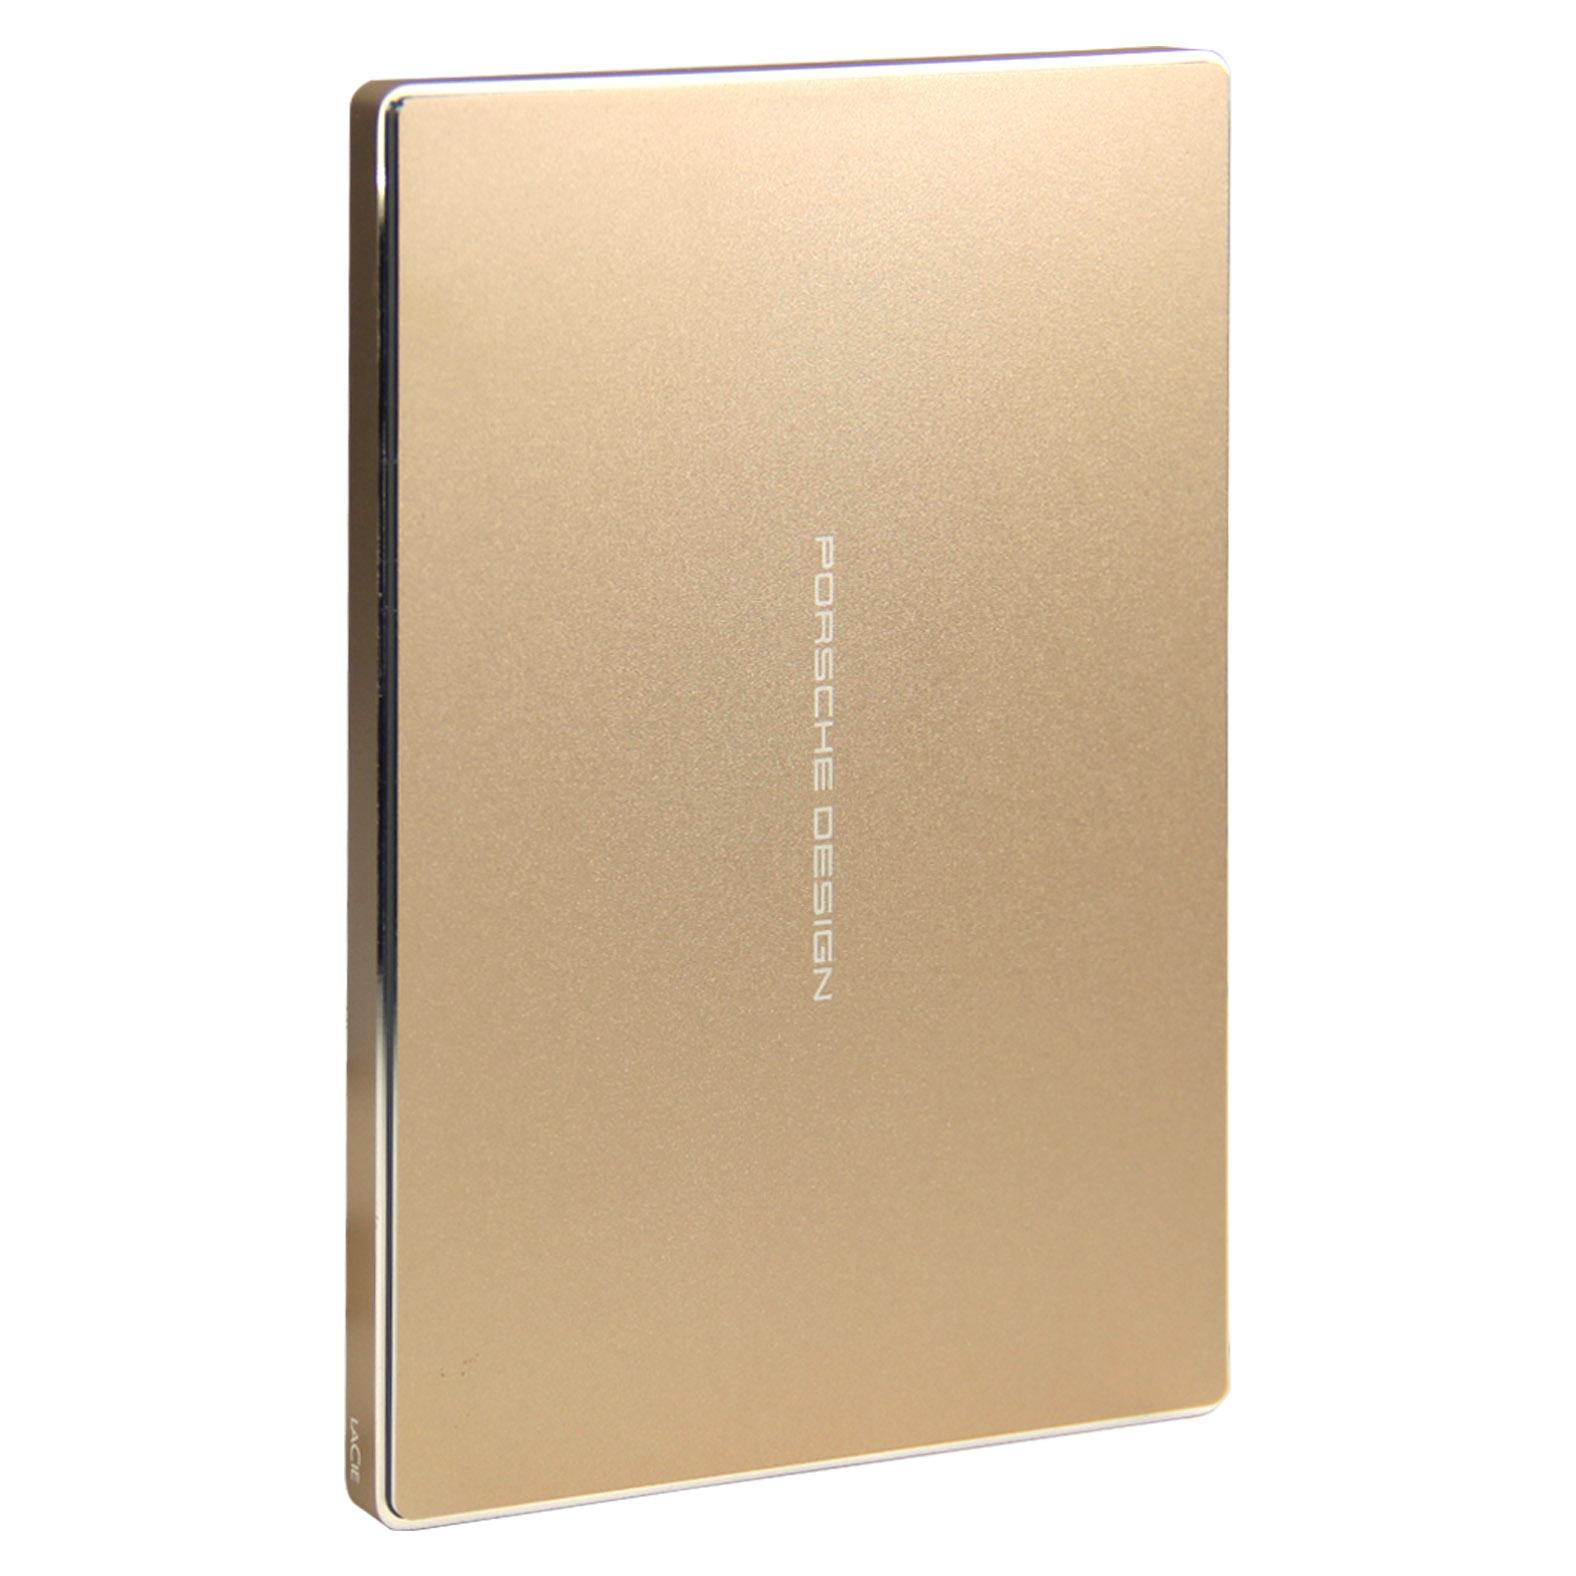 Les LaCieP92272TUSB-C2.5 Zoll festplatte nabob Gold Edition - Paket post